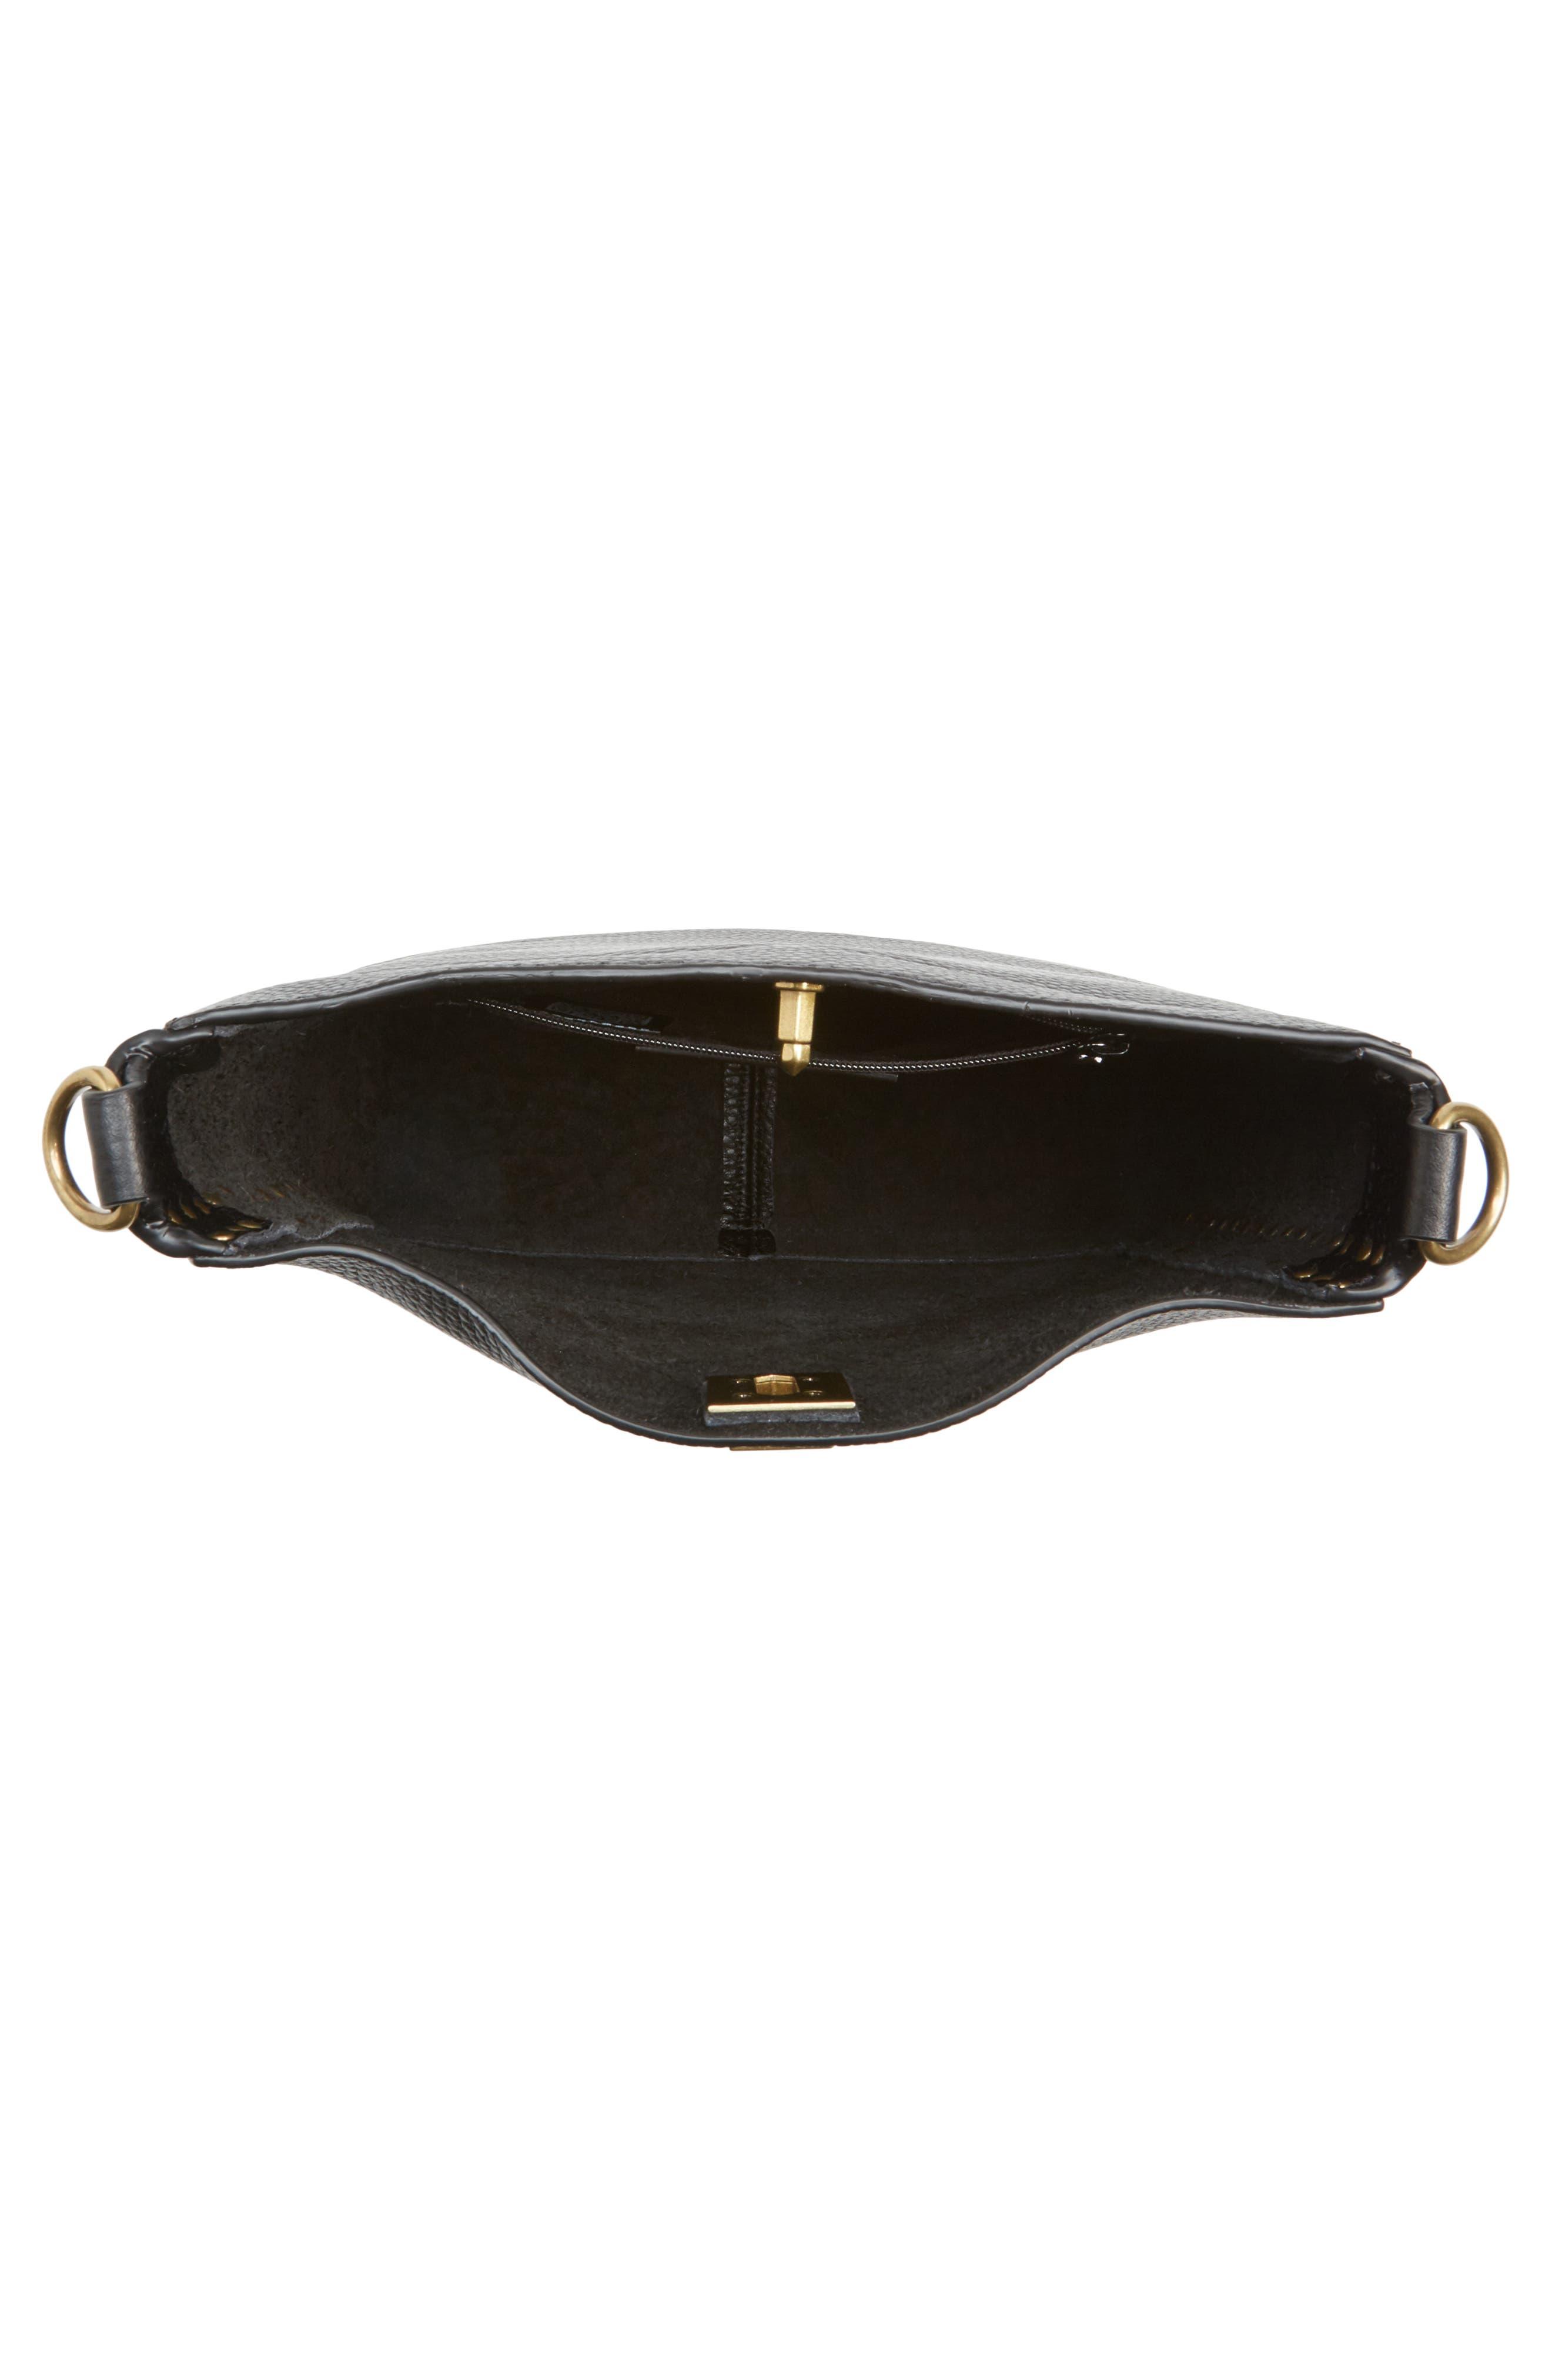 REBECCA MINKOFF, Small Darren Deerskin Leather Feed Bag, Alternate thumbnail 5, color, BLACK